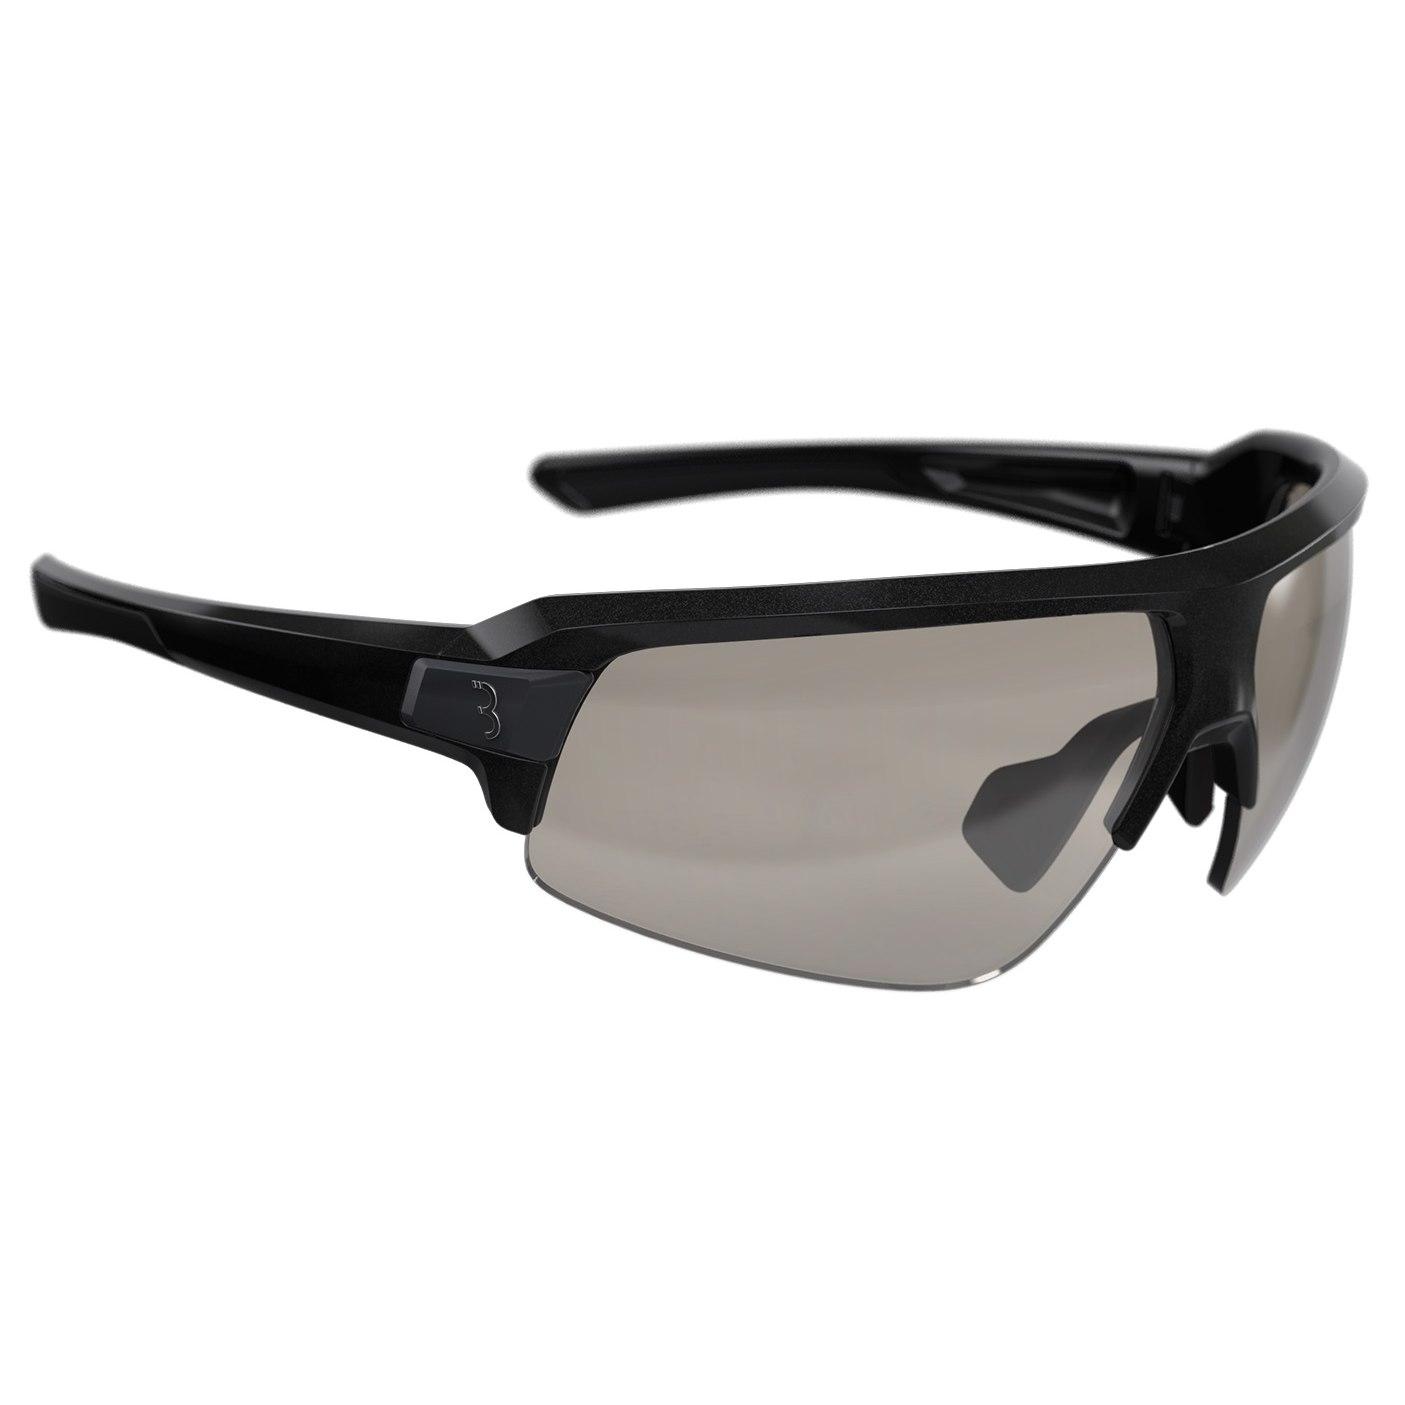 BBB CyclingImpulse BSG-62PH Metallic Black Glossy | Photochromic PC Glasses